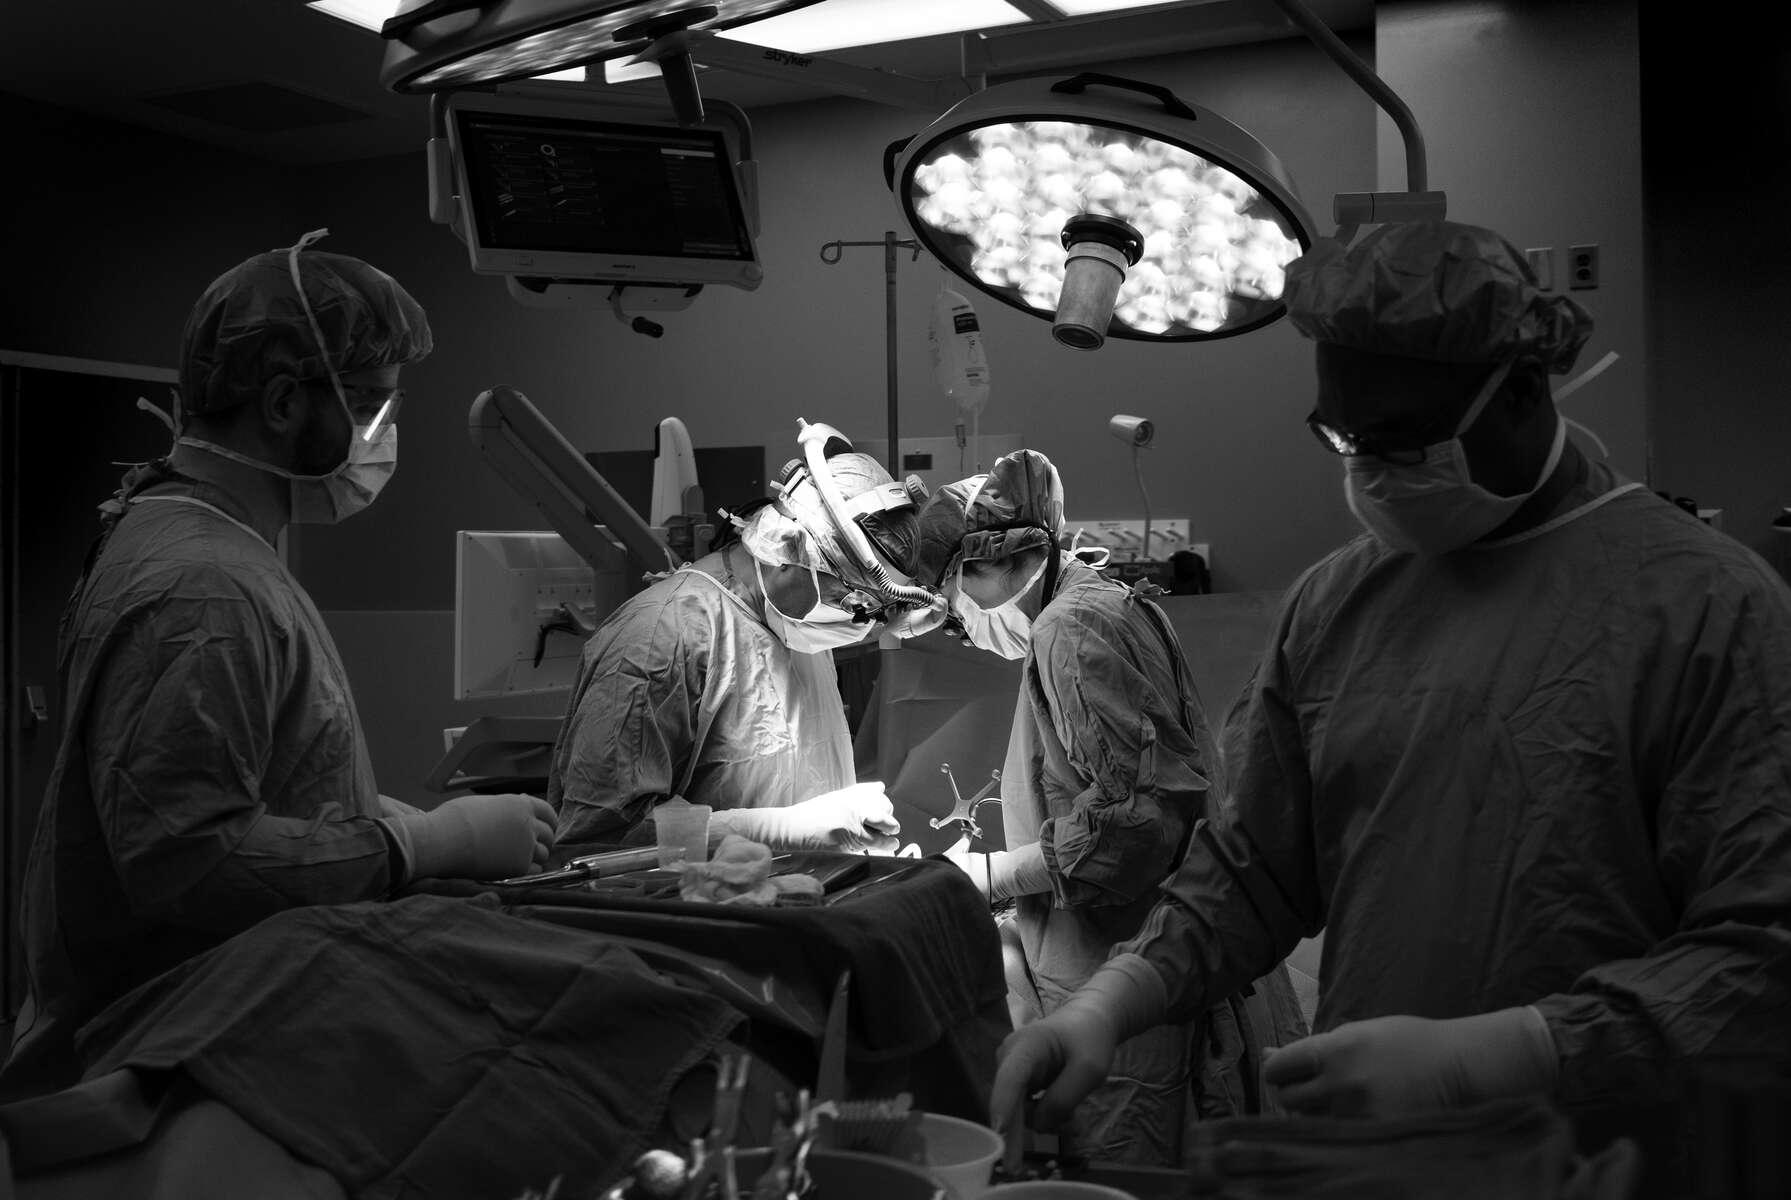 Dr. Mitesh Shah operating on a spine at IU Health Methodist Hospital.